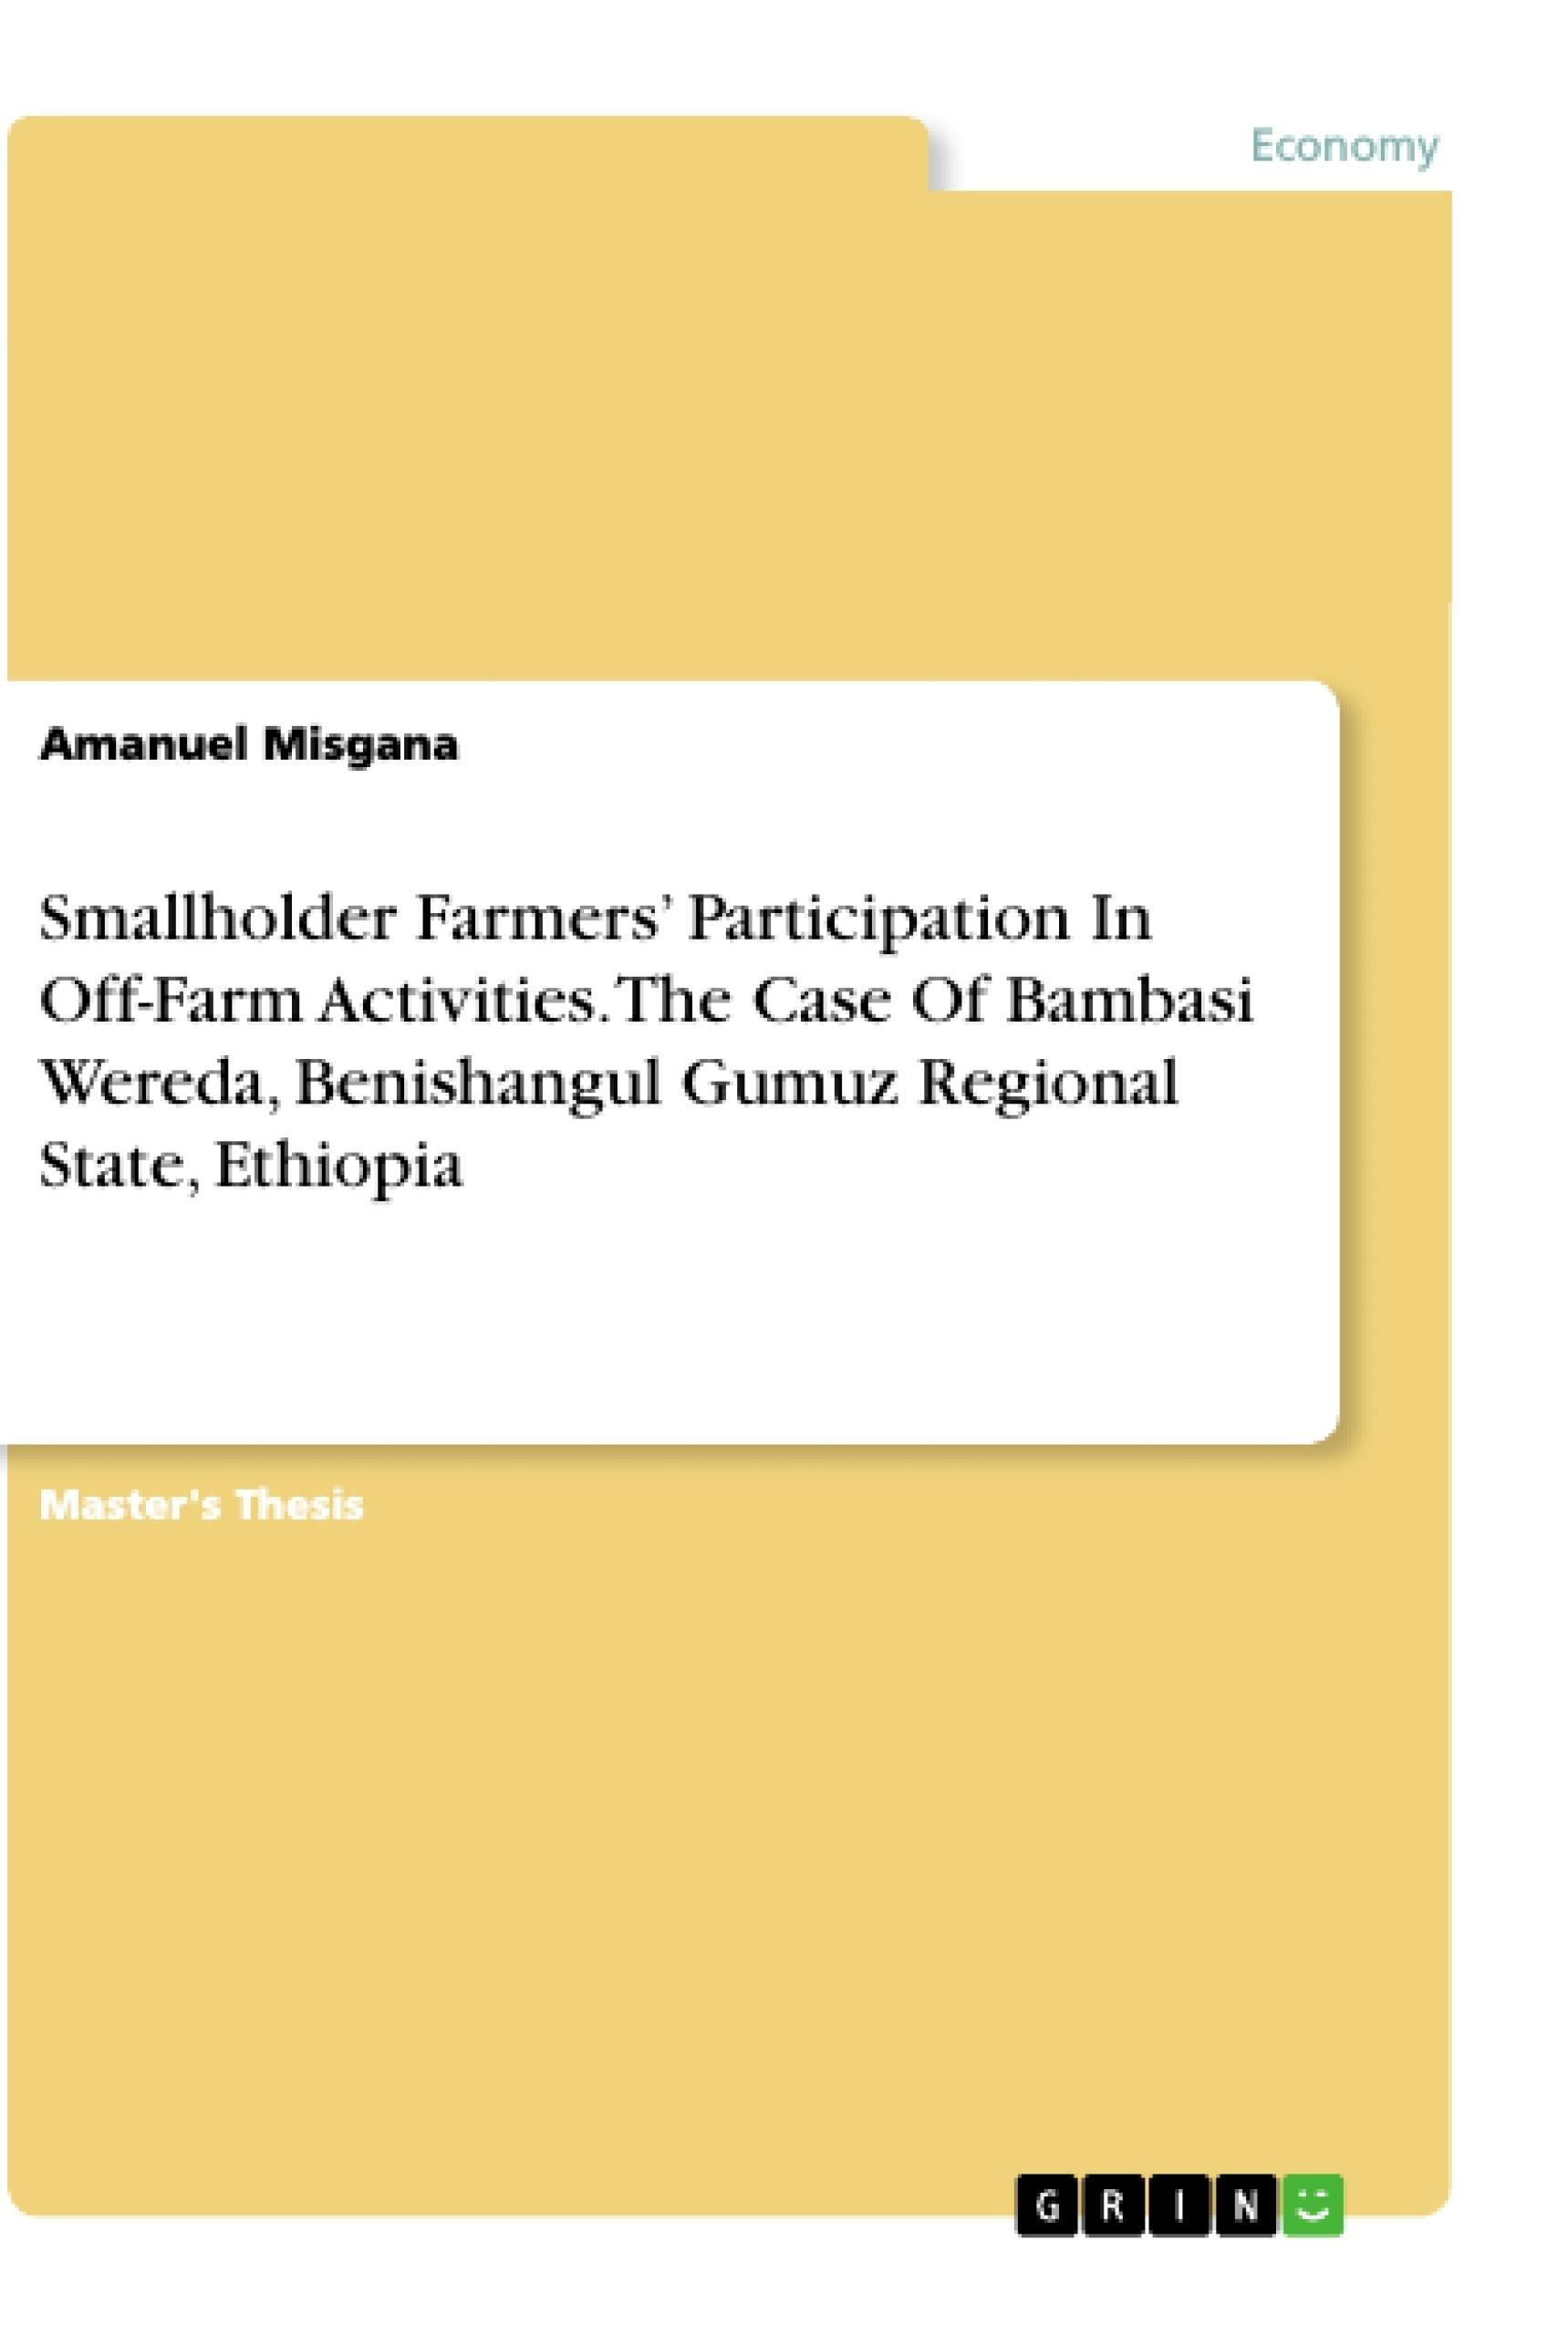 Title: Smallholder Farmers' Participation In Off-Farm Activities. The Case Of Bambasi Wereda, Benishangul Gumuz Regional State, Ethiopia